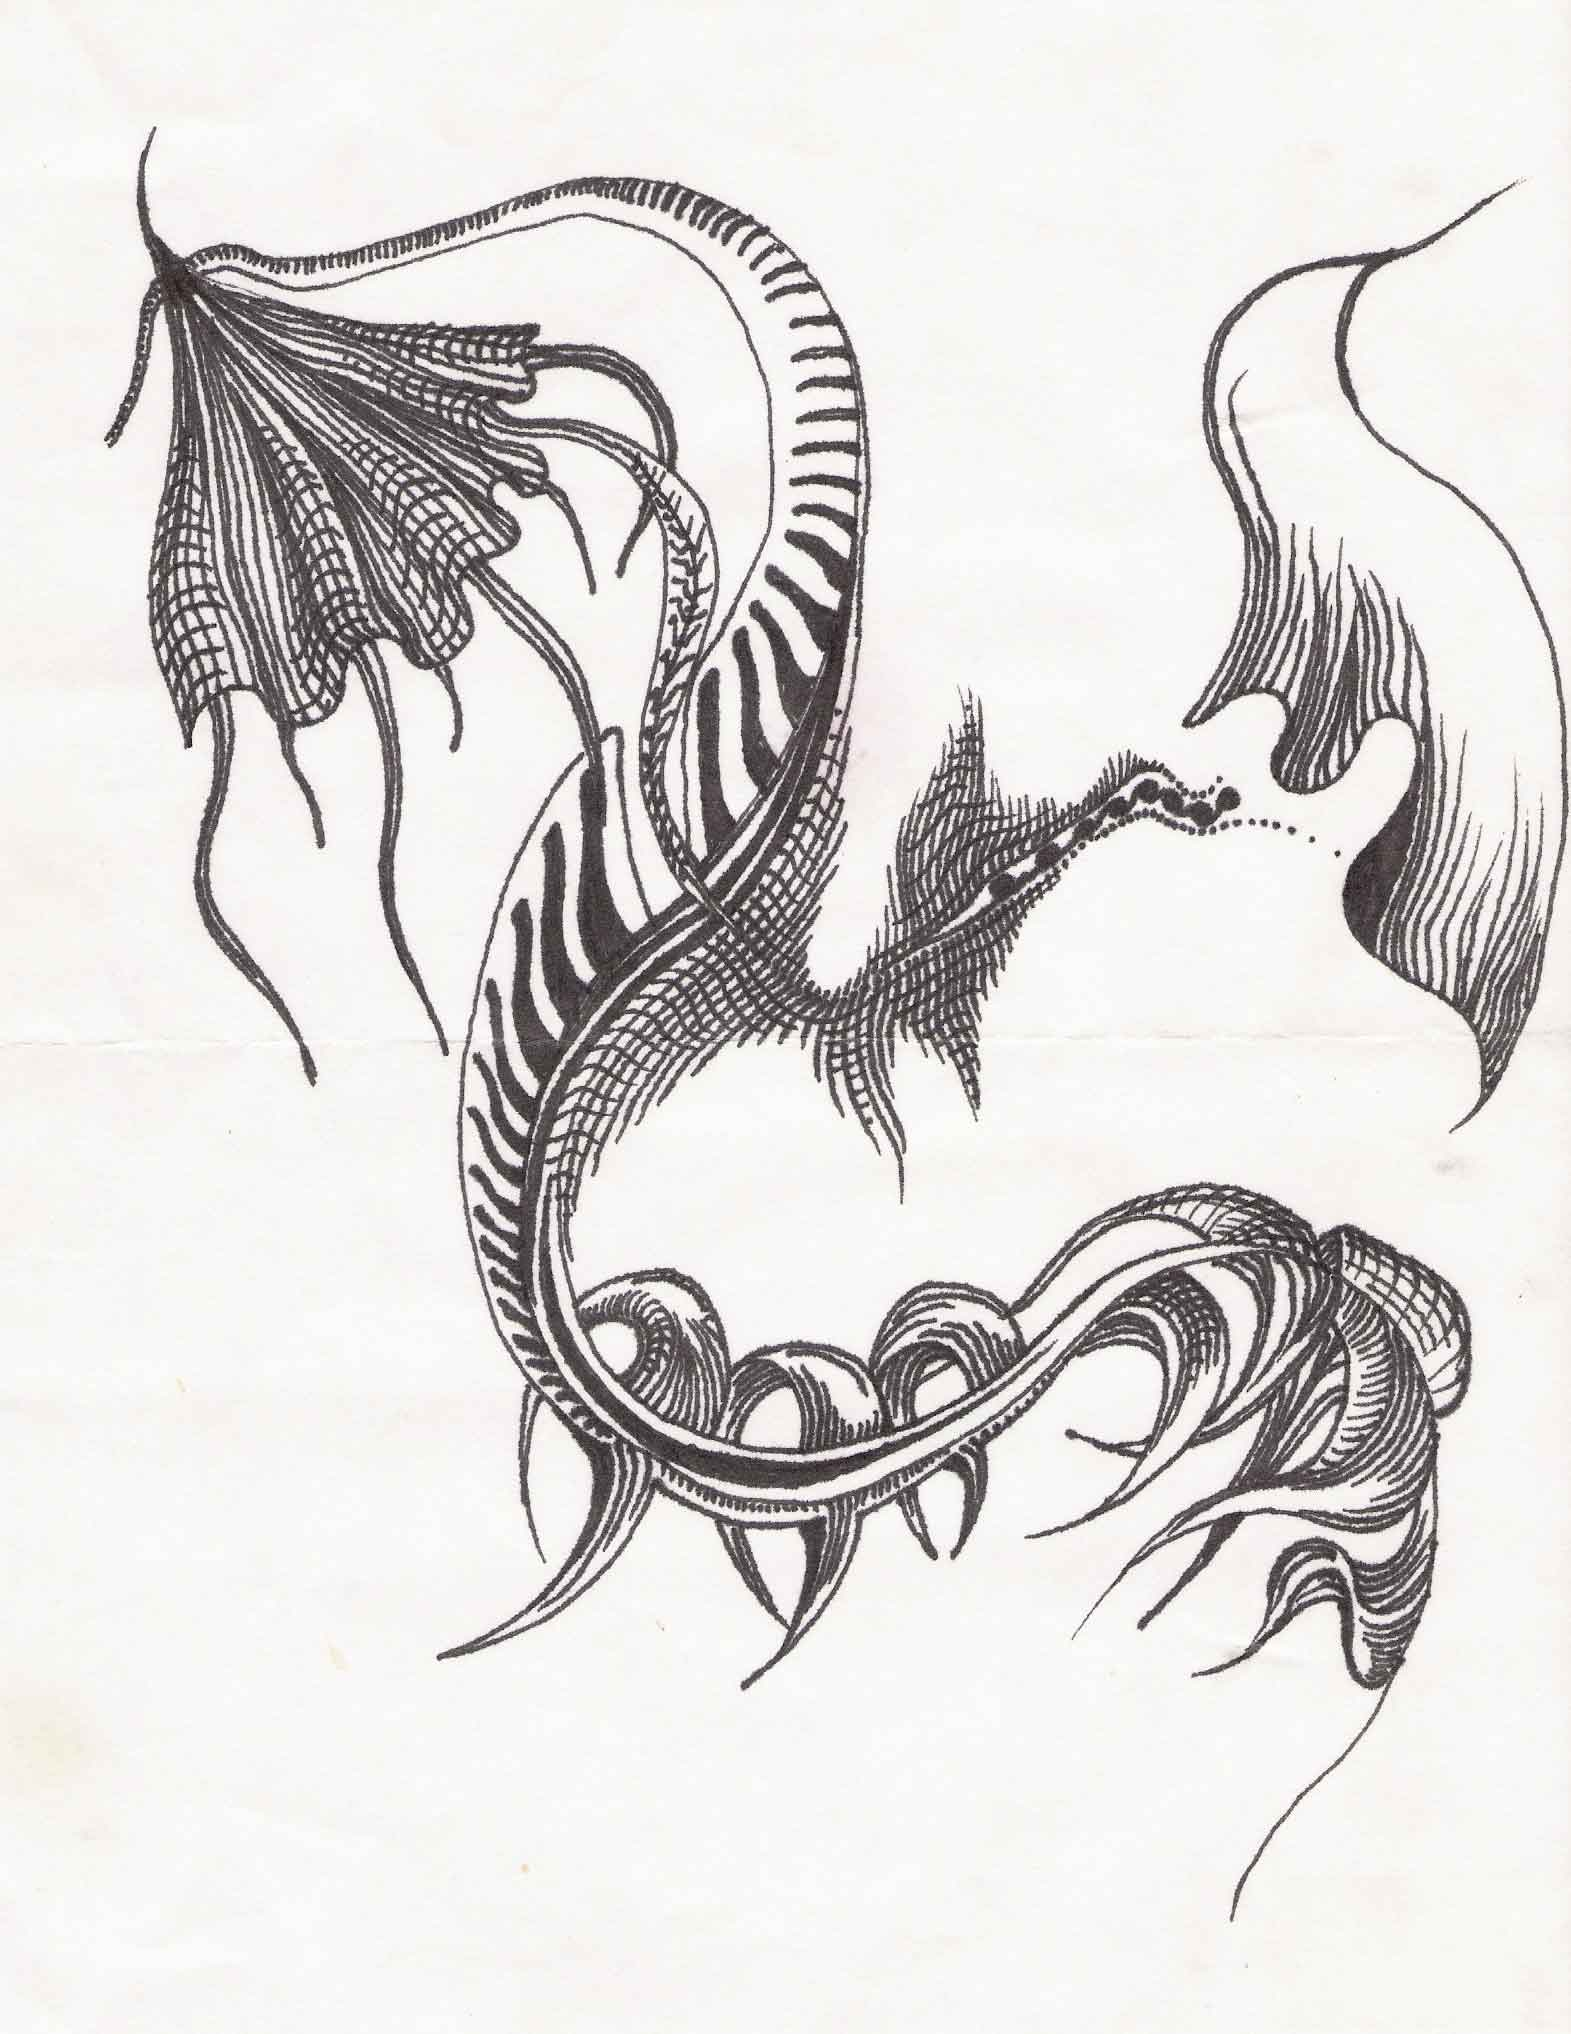 sketch-25-sept-05.jpg